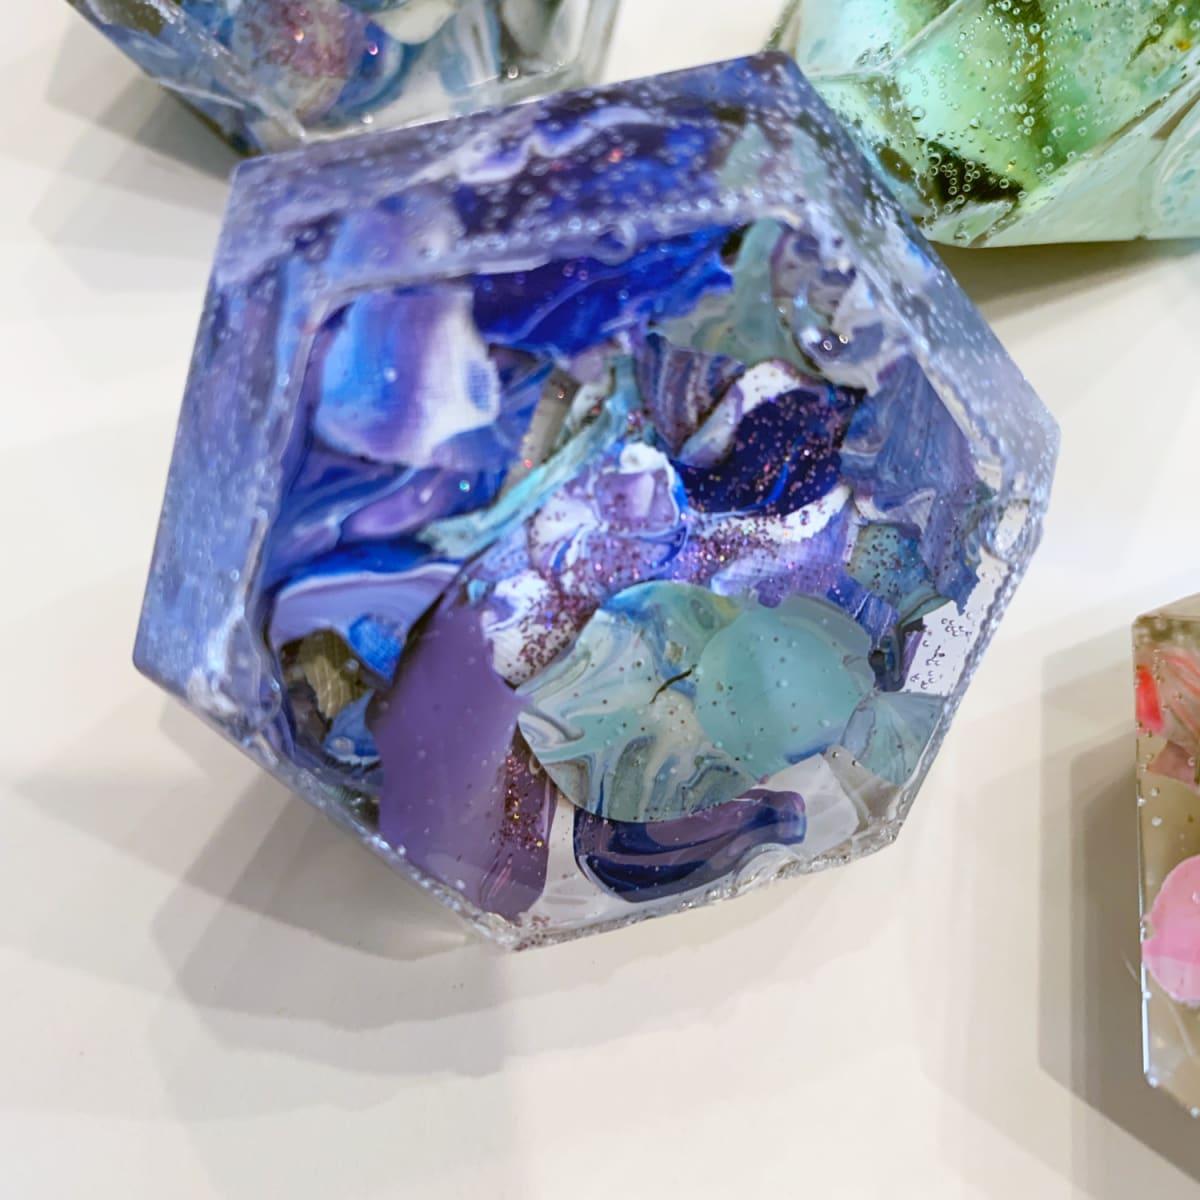 Diamond in the Rough - Blue Purple - Acrylic Skins #1 by Susi Schuele